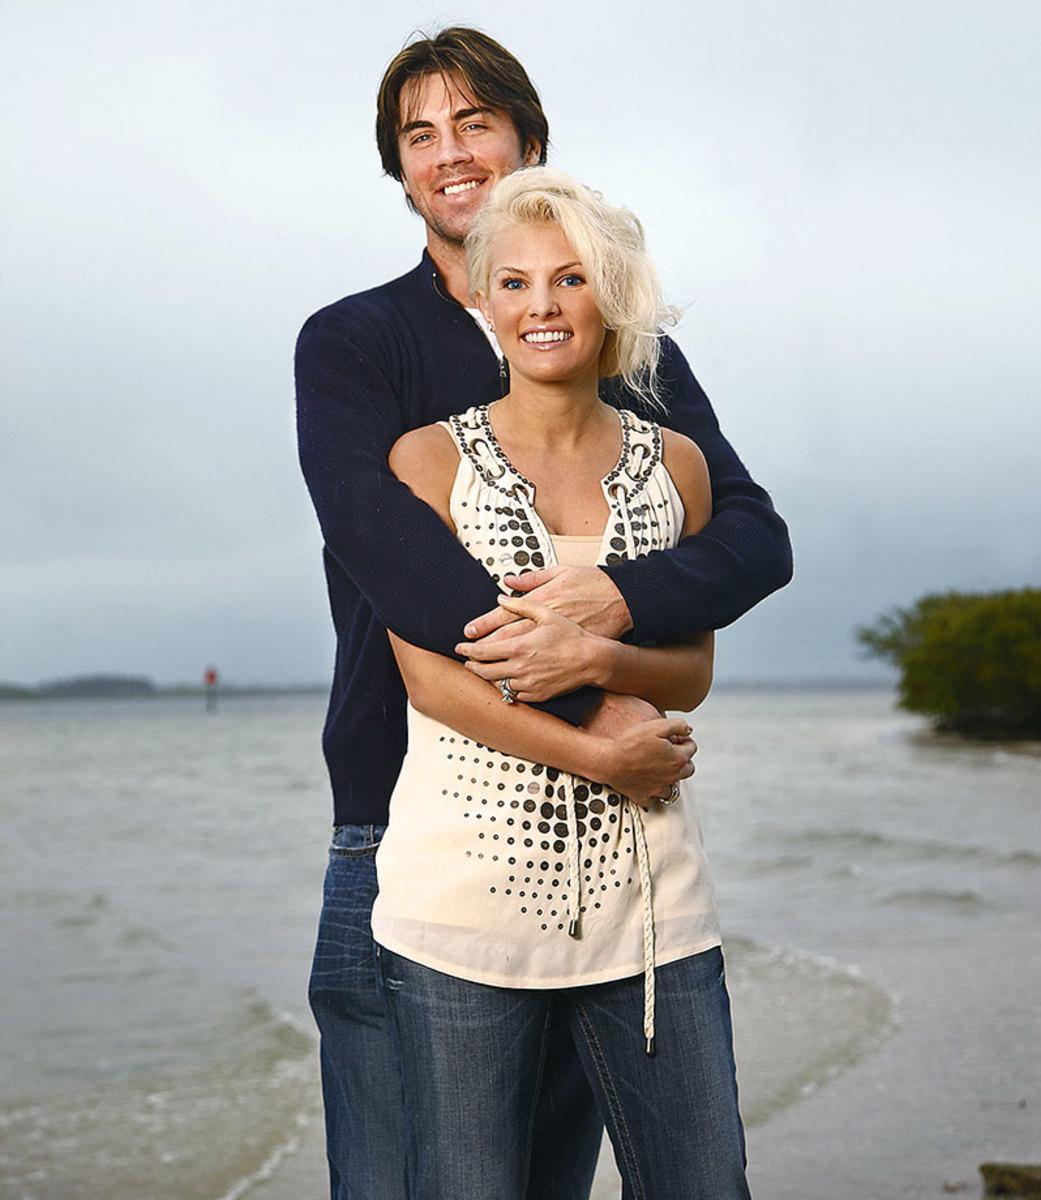 2009-0129-Cole-Hamels-wife-Heidi-Strobel-beach-076669602_0.jpg